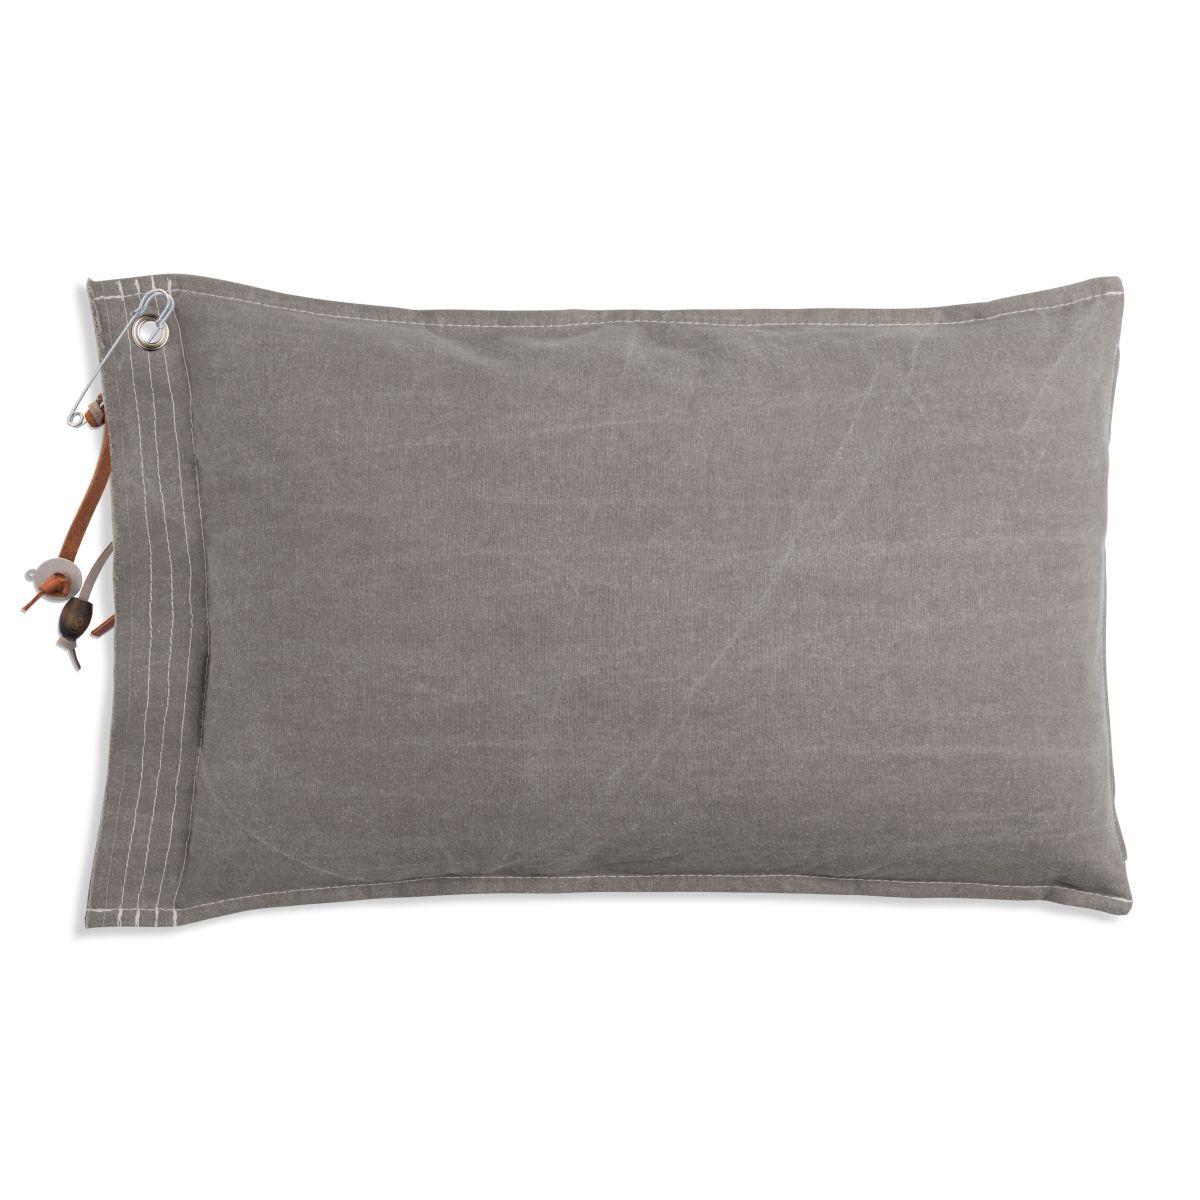 knit factory 1061309 mara kussen60x40 stone green 2